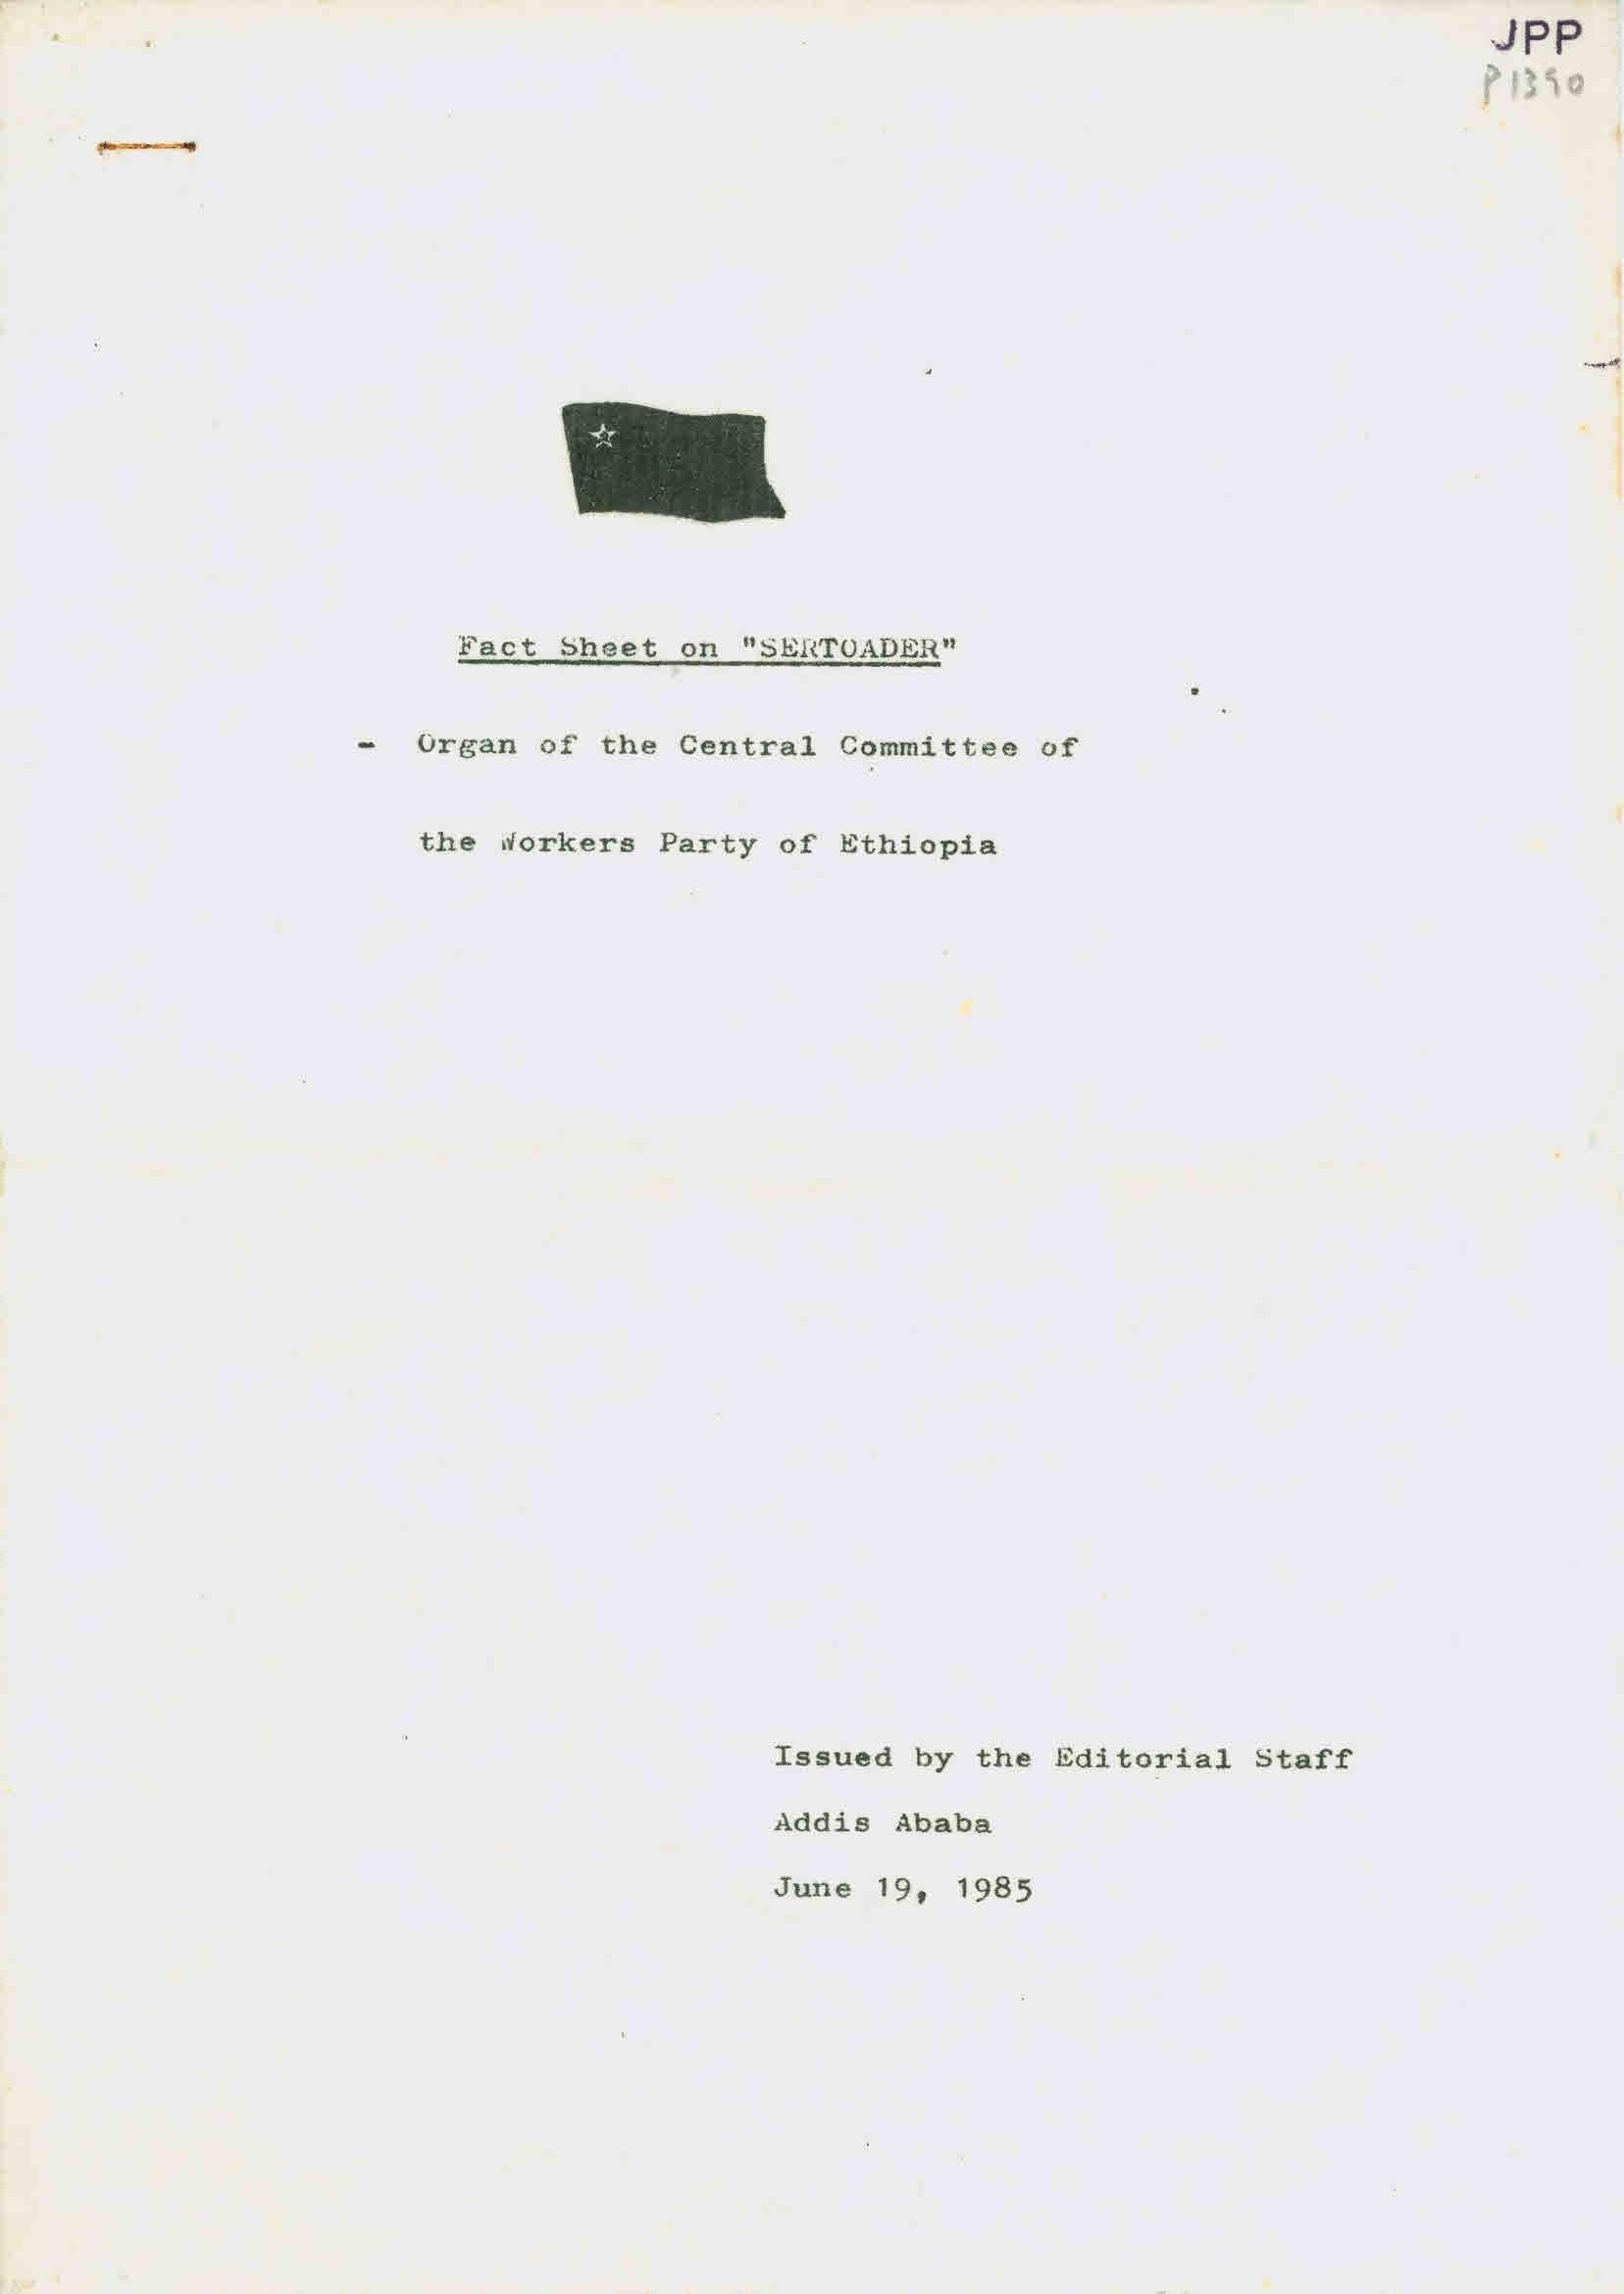 Copy of Fact Sheet on SERTOADER